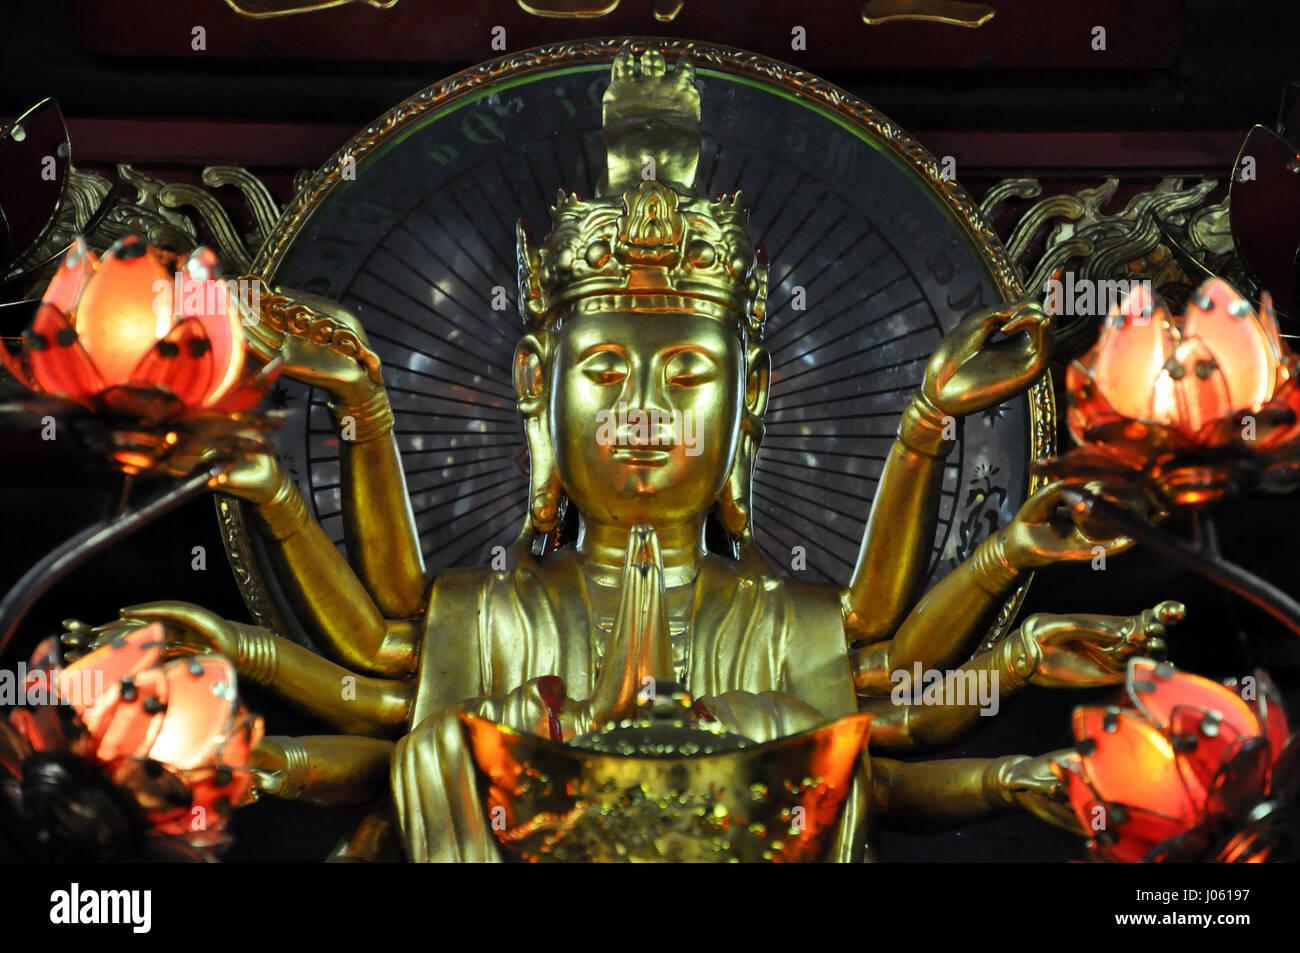 HANOI, VIETNAM - FEBRUARY 19, 2013: Small shrine devoted to Avalokitesvara Boddhisatva inside the One Pillar Pagoda Stock Photo